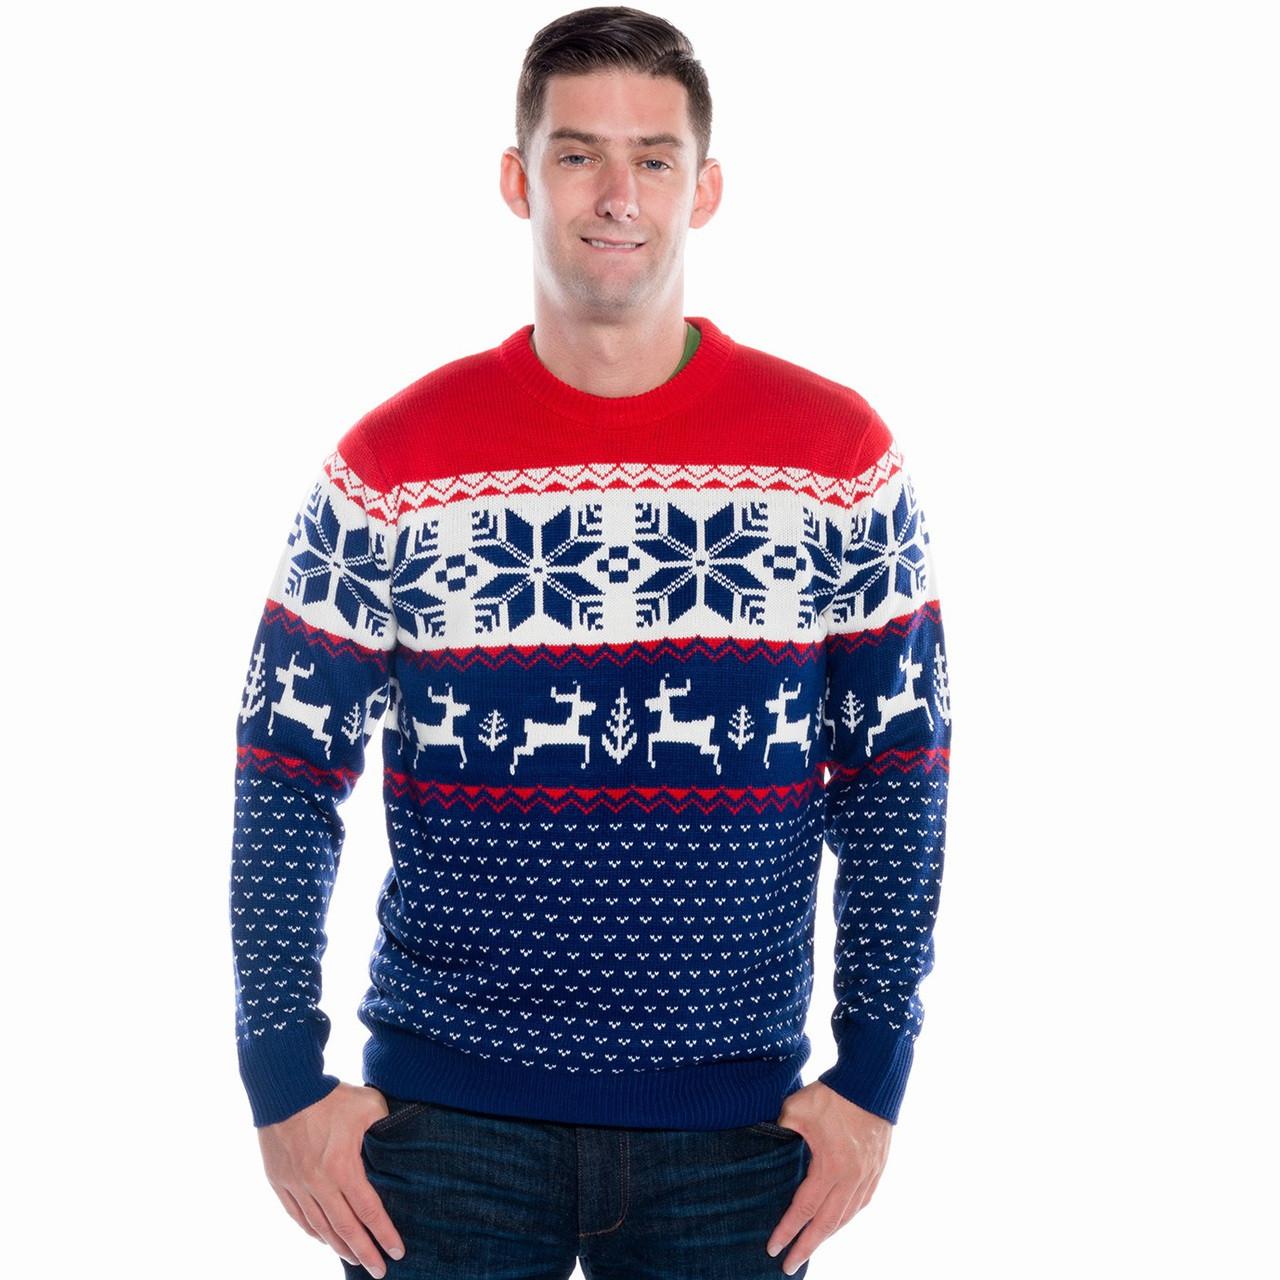 Winter Wonderland Christmas Sweater. Ladies.